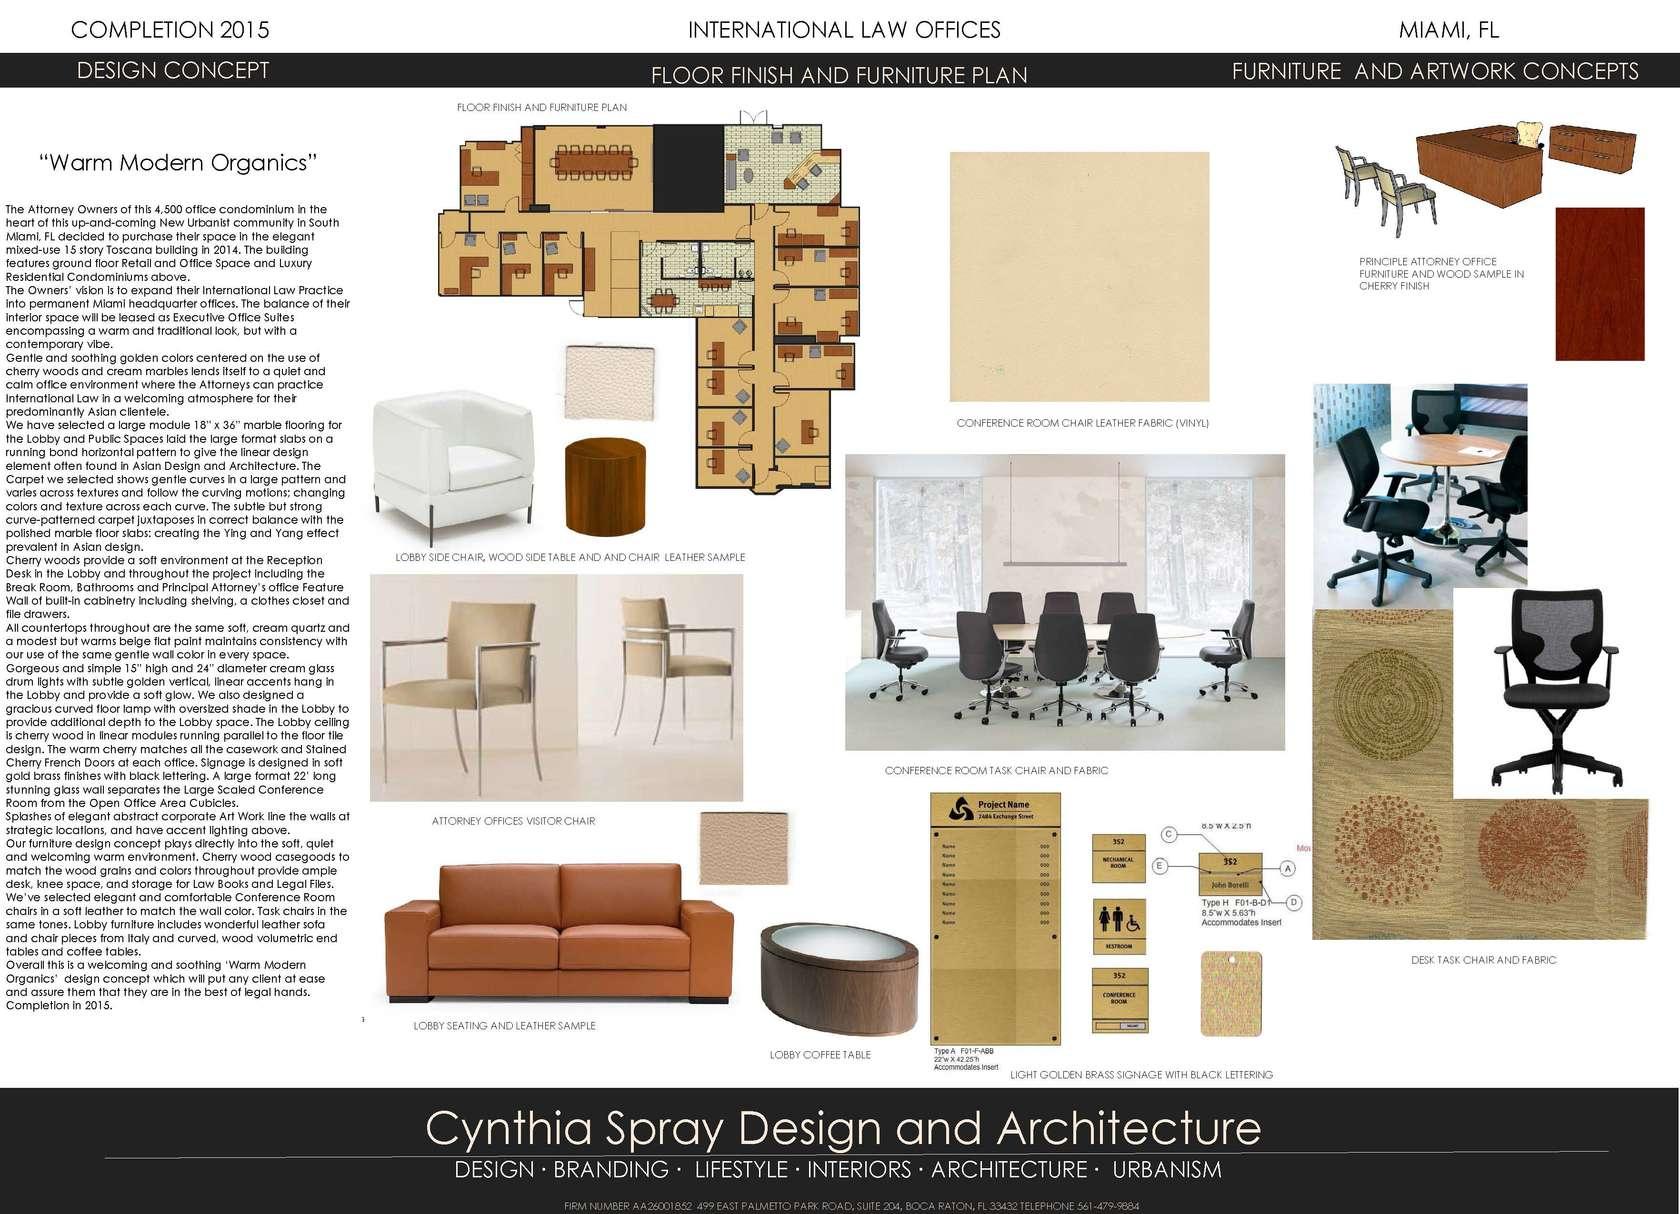 Cynthia Spray Design and Architecture - Architizer